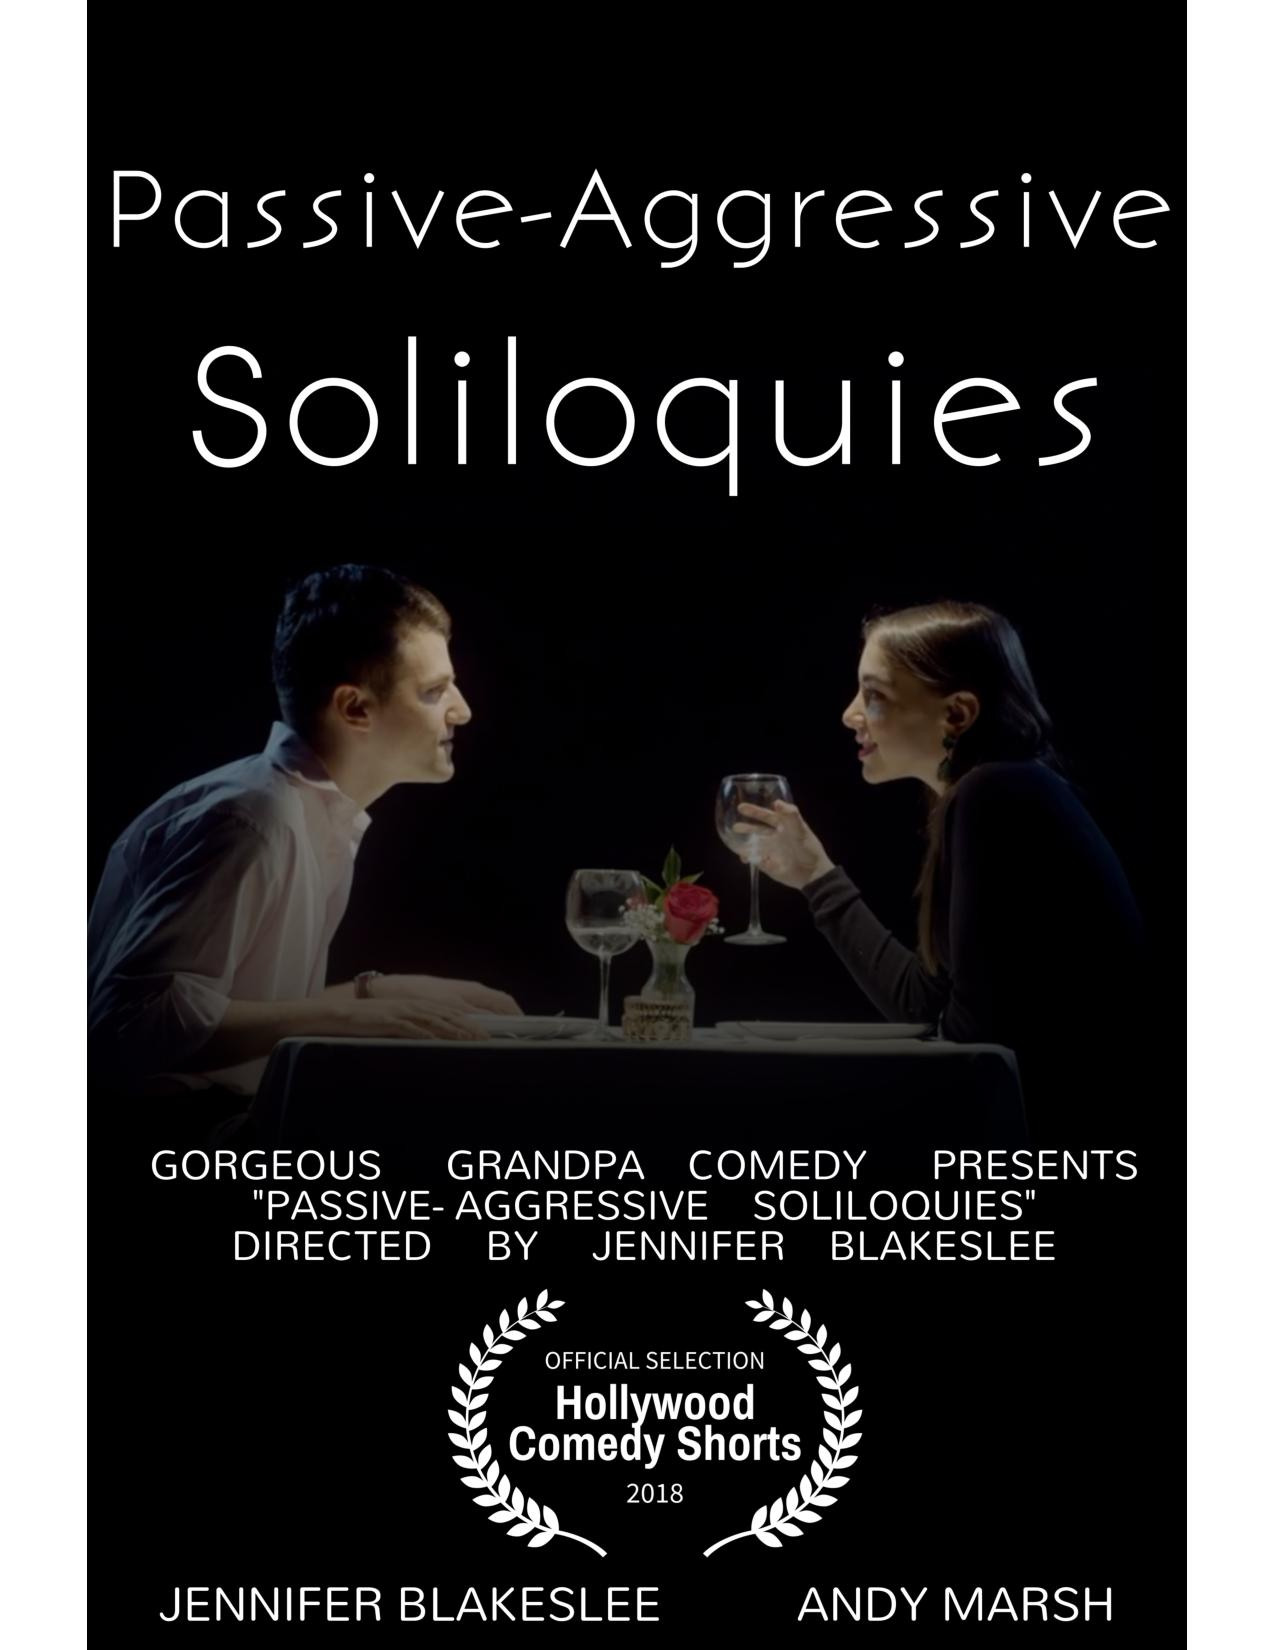 Jennifer Blakeslee - Passive-Aggressive Soliloquies Poster-page-001.jpg